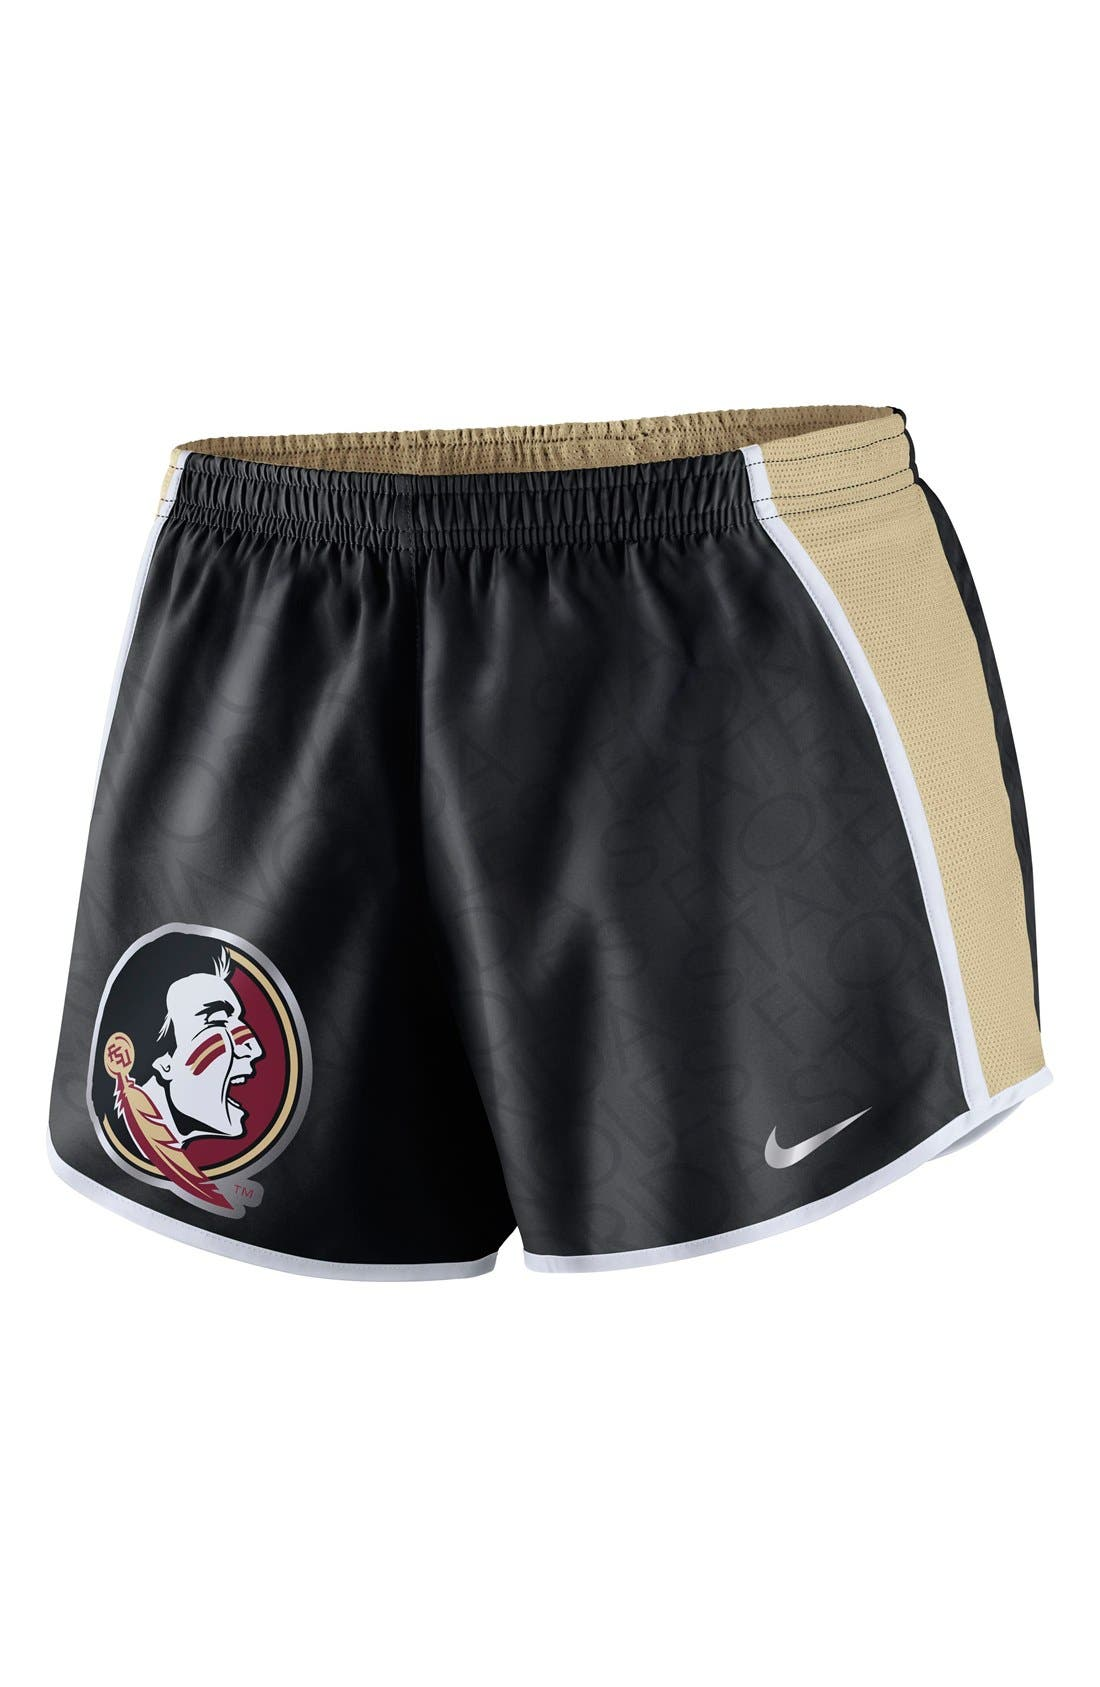 Main Image - Nike 'Champ Drive - Florida State University' Logo Dri-FIT Shorts